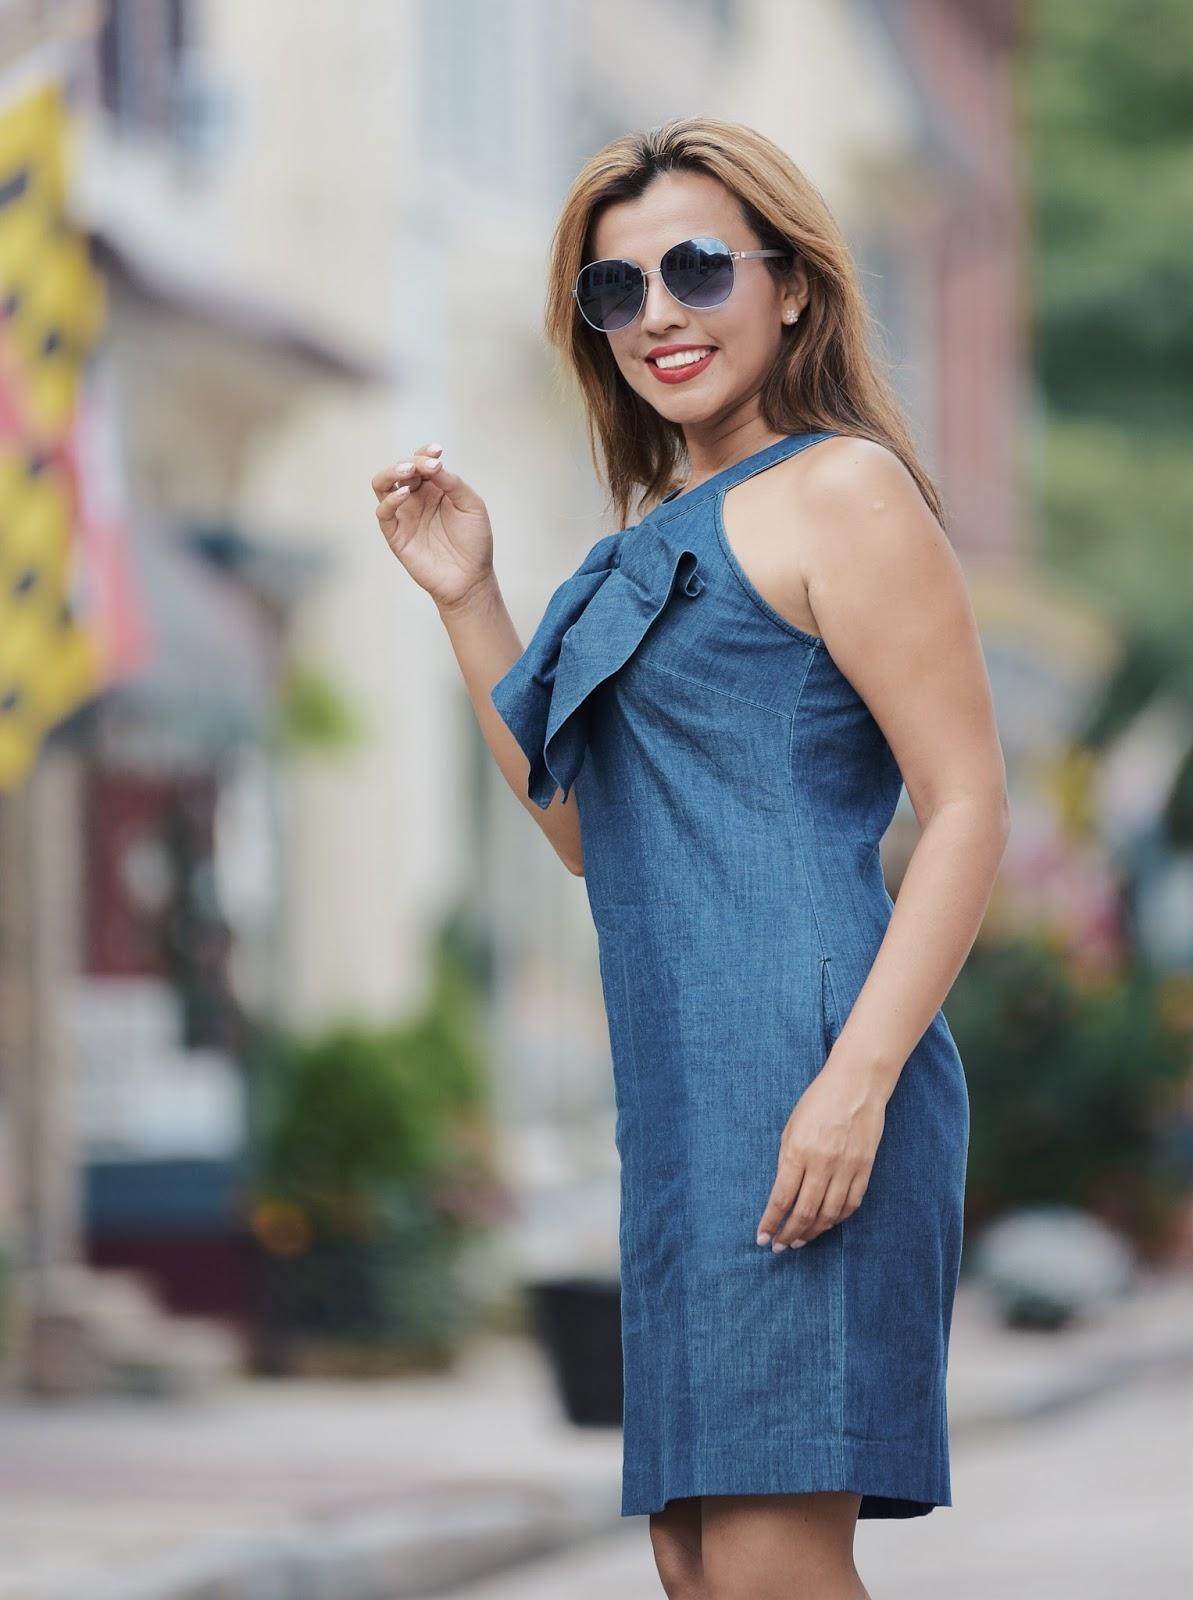 Simply Sophisticated Summer by Mari Estilo partnering with Banana Republic